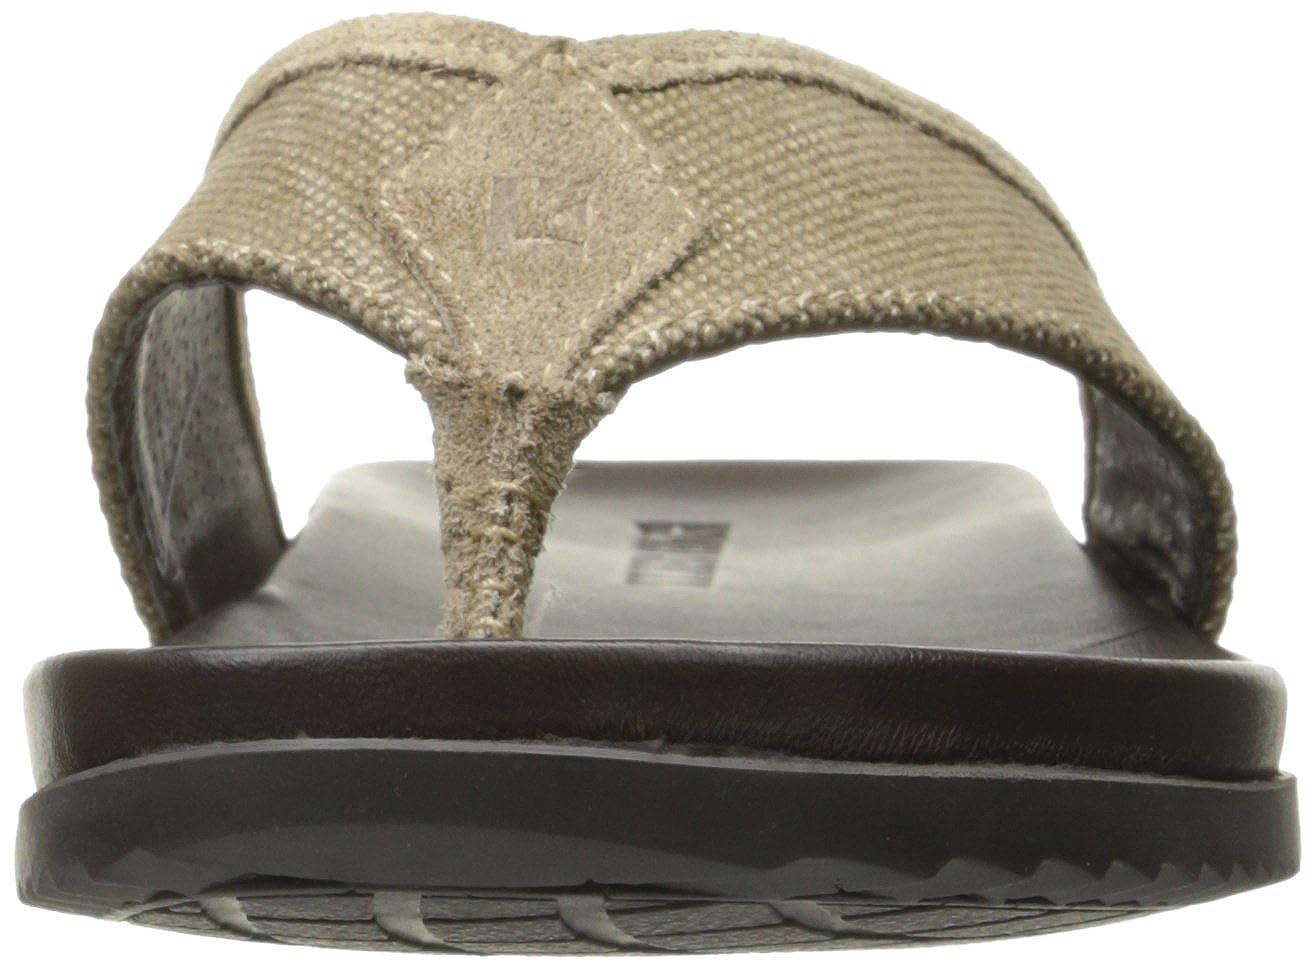 bec4be7a7f28 Amazon.com  Ben Sherman Men s Milo Thong Dress Sandal  Shoes